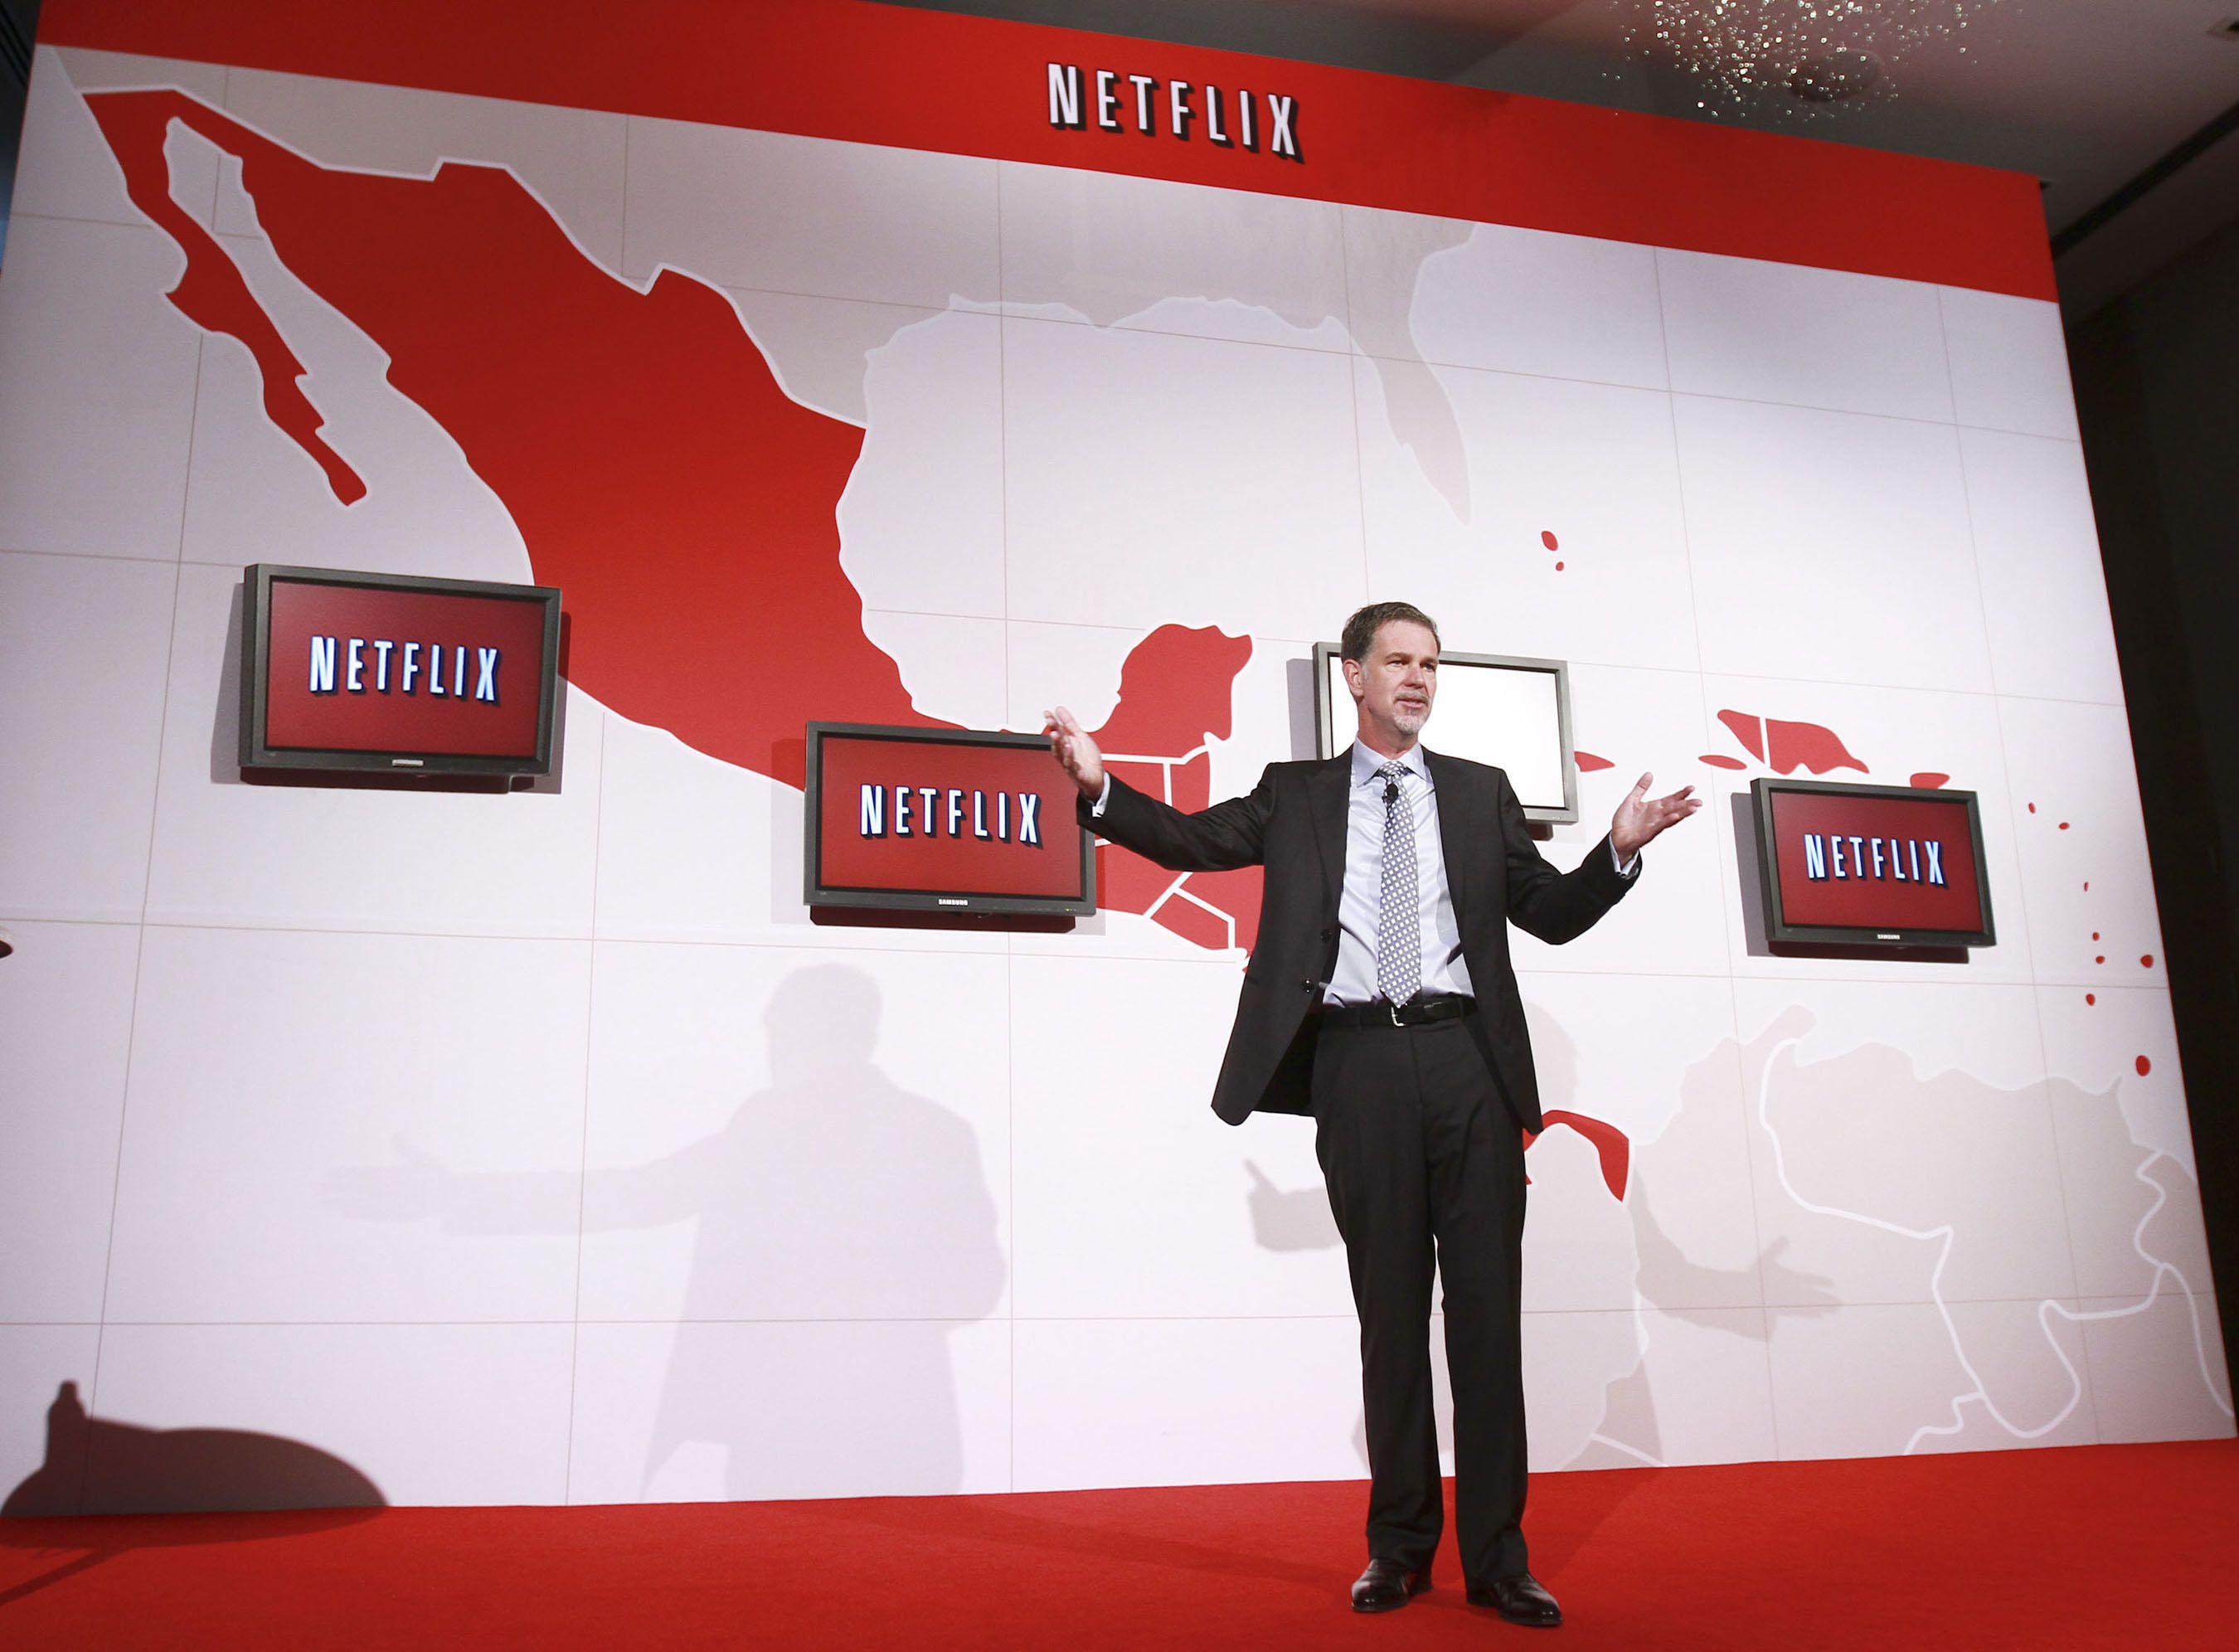 Netflix Reed Hastings Net Neutrality Music